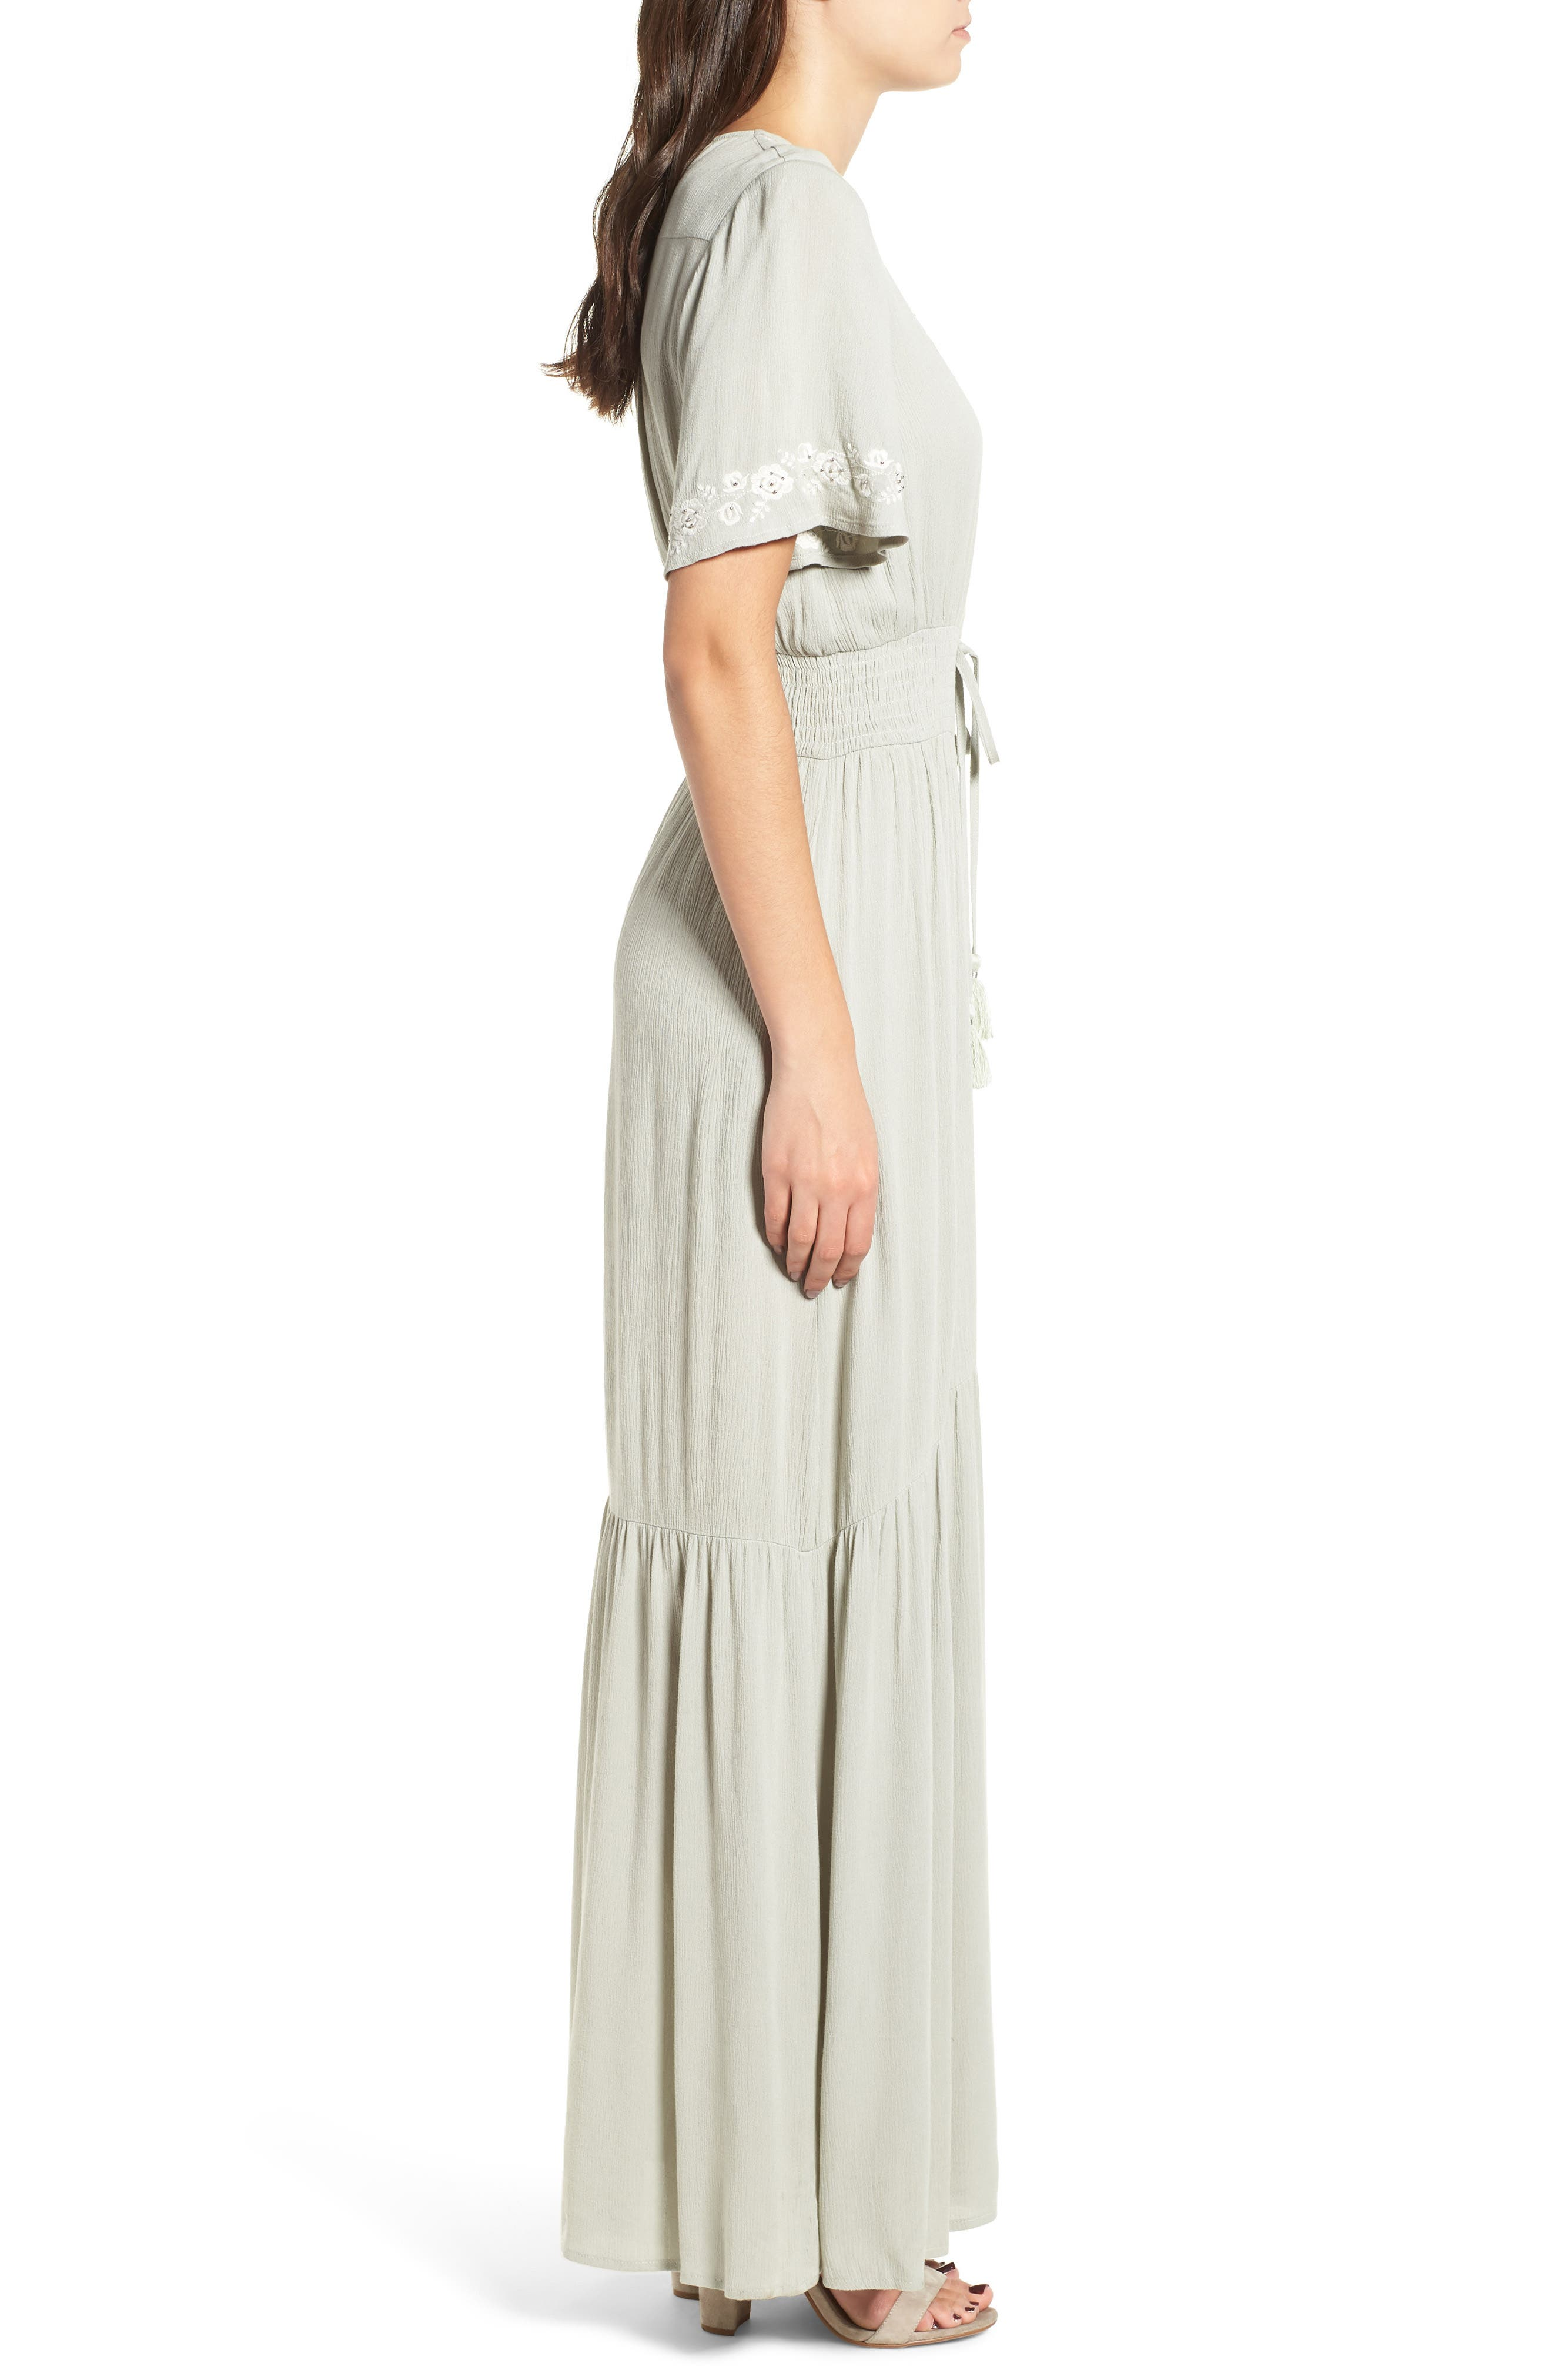 Athena Embroidered Maxi Dress,                             Alternate thumbnail 4, color,                             Sage